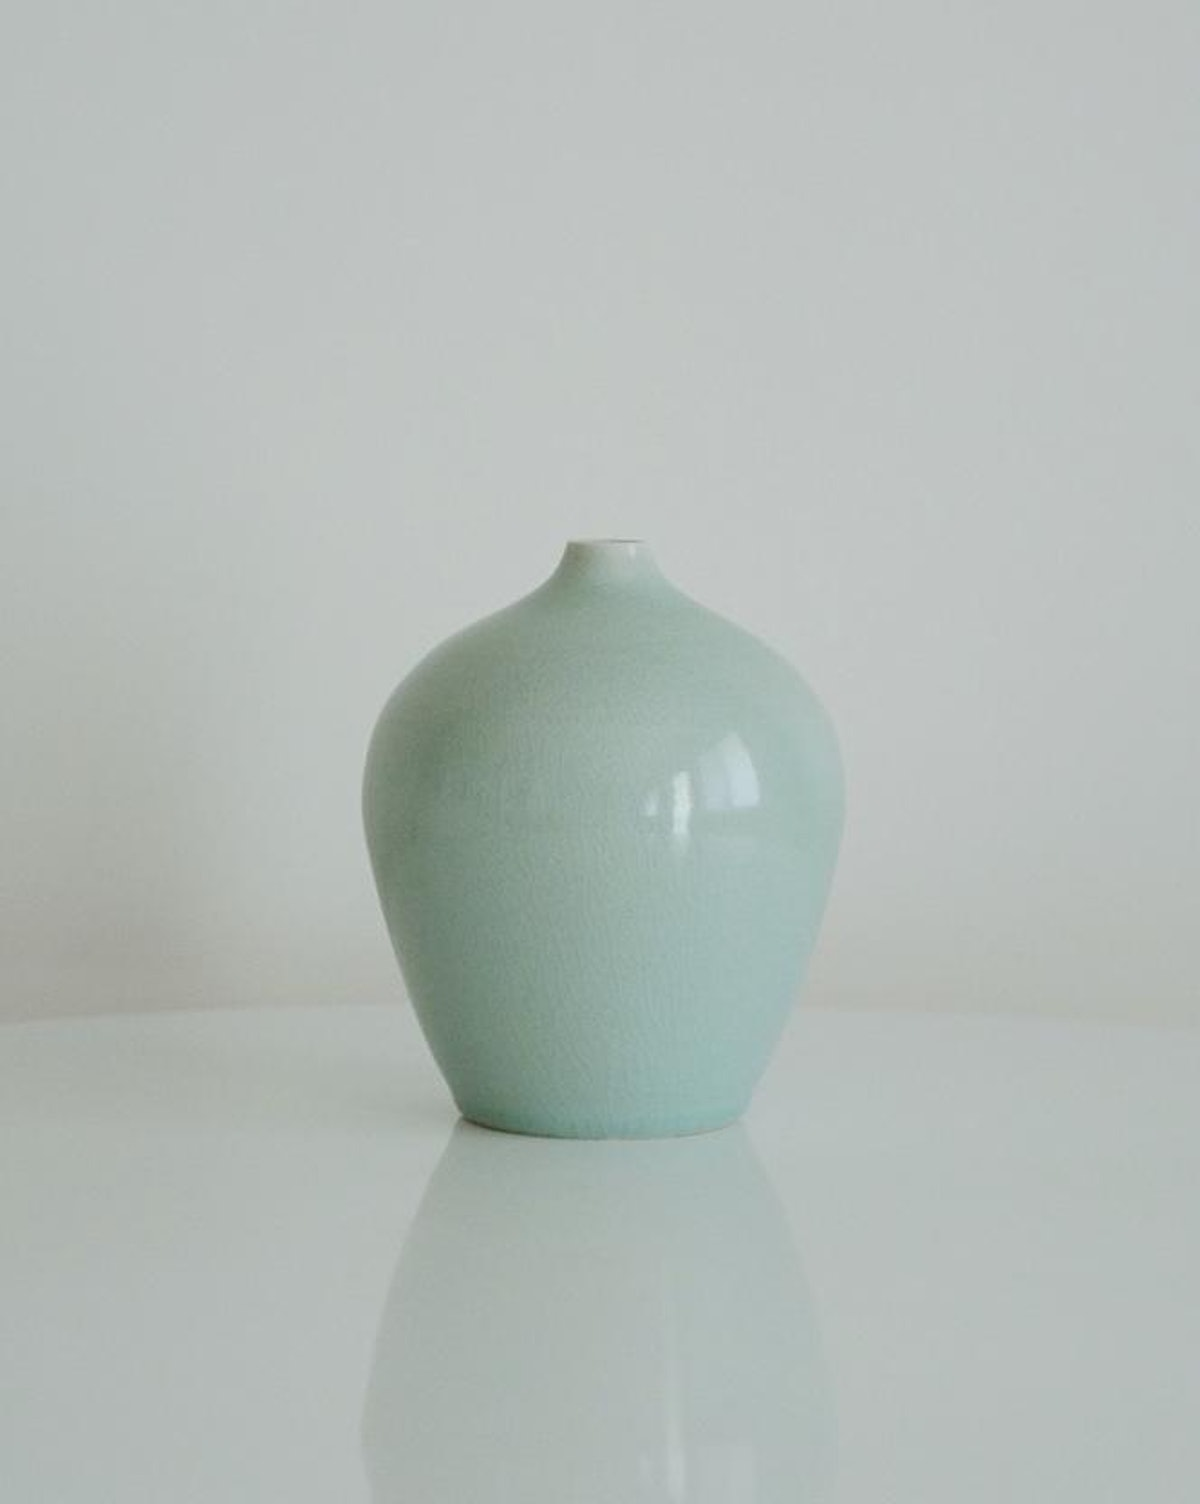 Light-Chungja(연청자) Vase